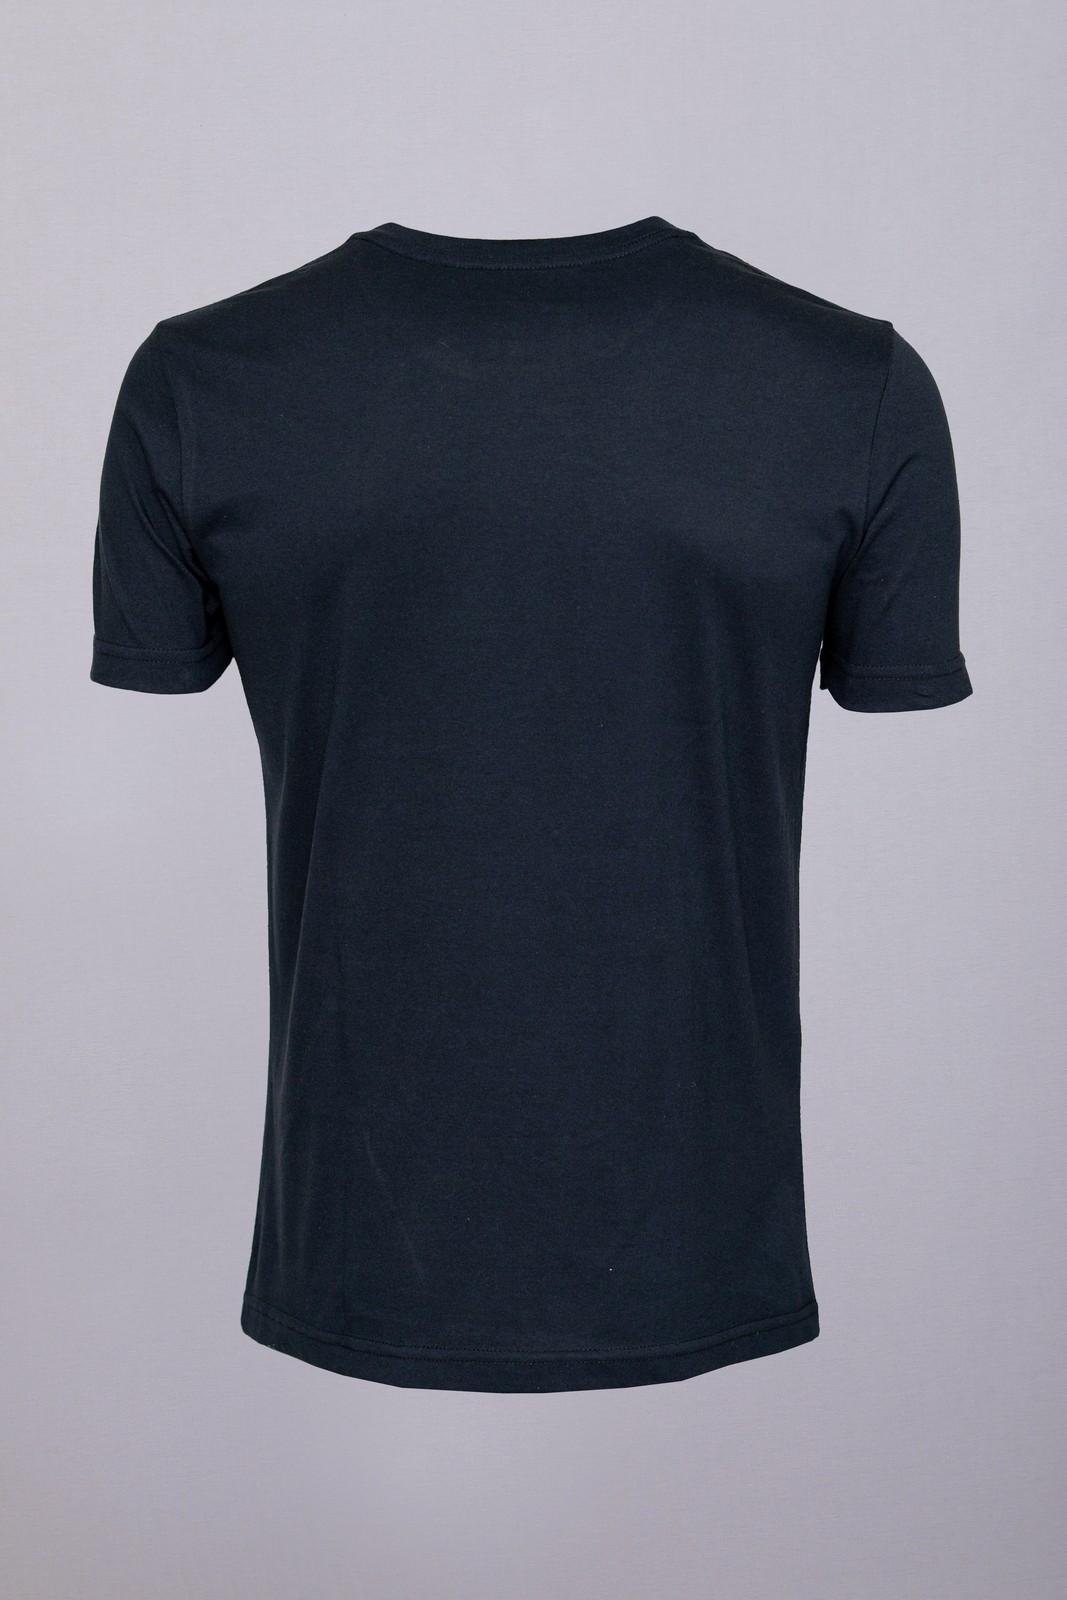 Camiseta Barrocco Free Yourself Preta